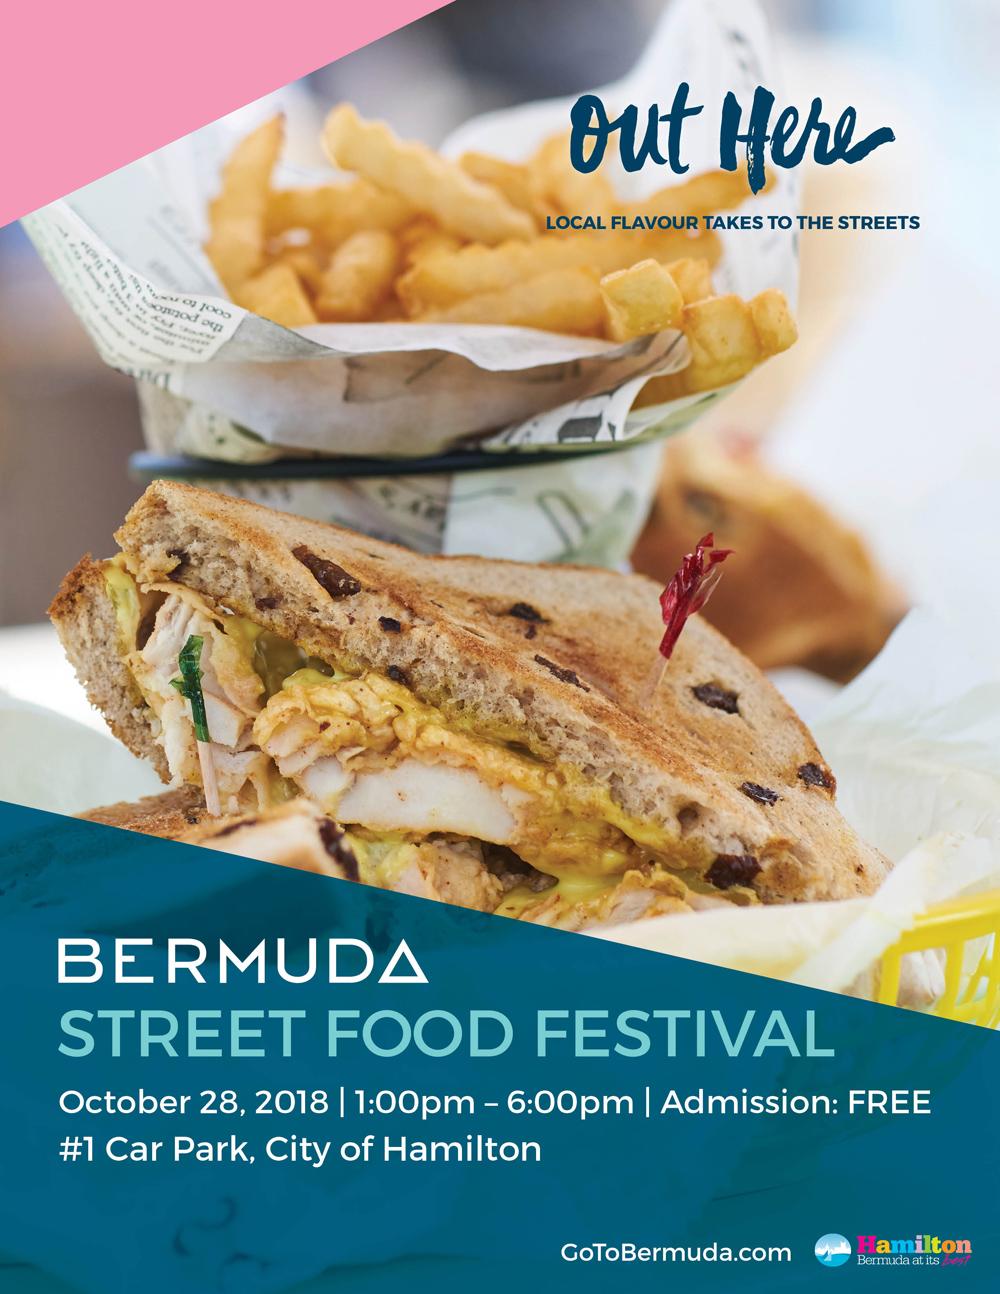 Bermuda Street Food Festival Oct 2018 (1)